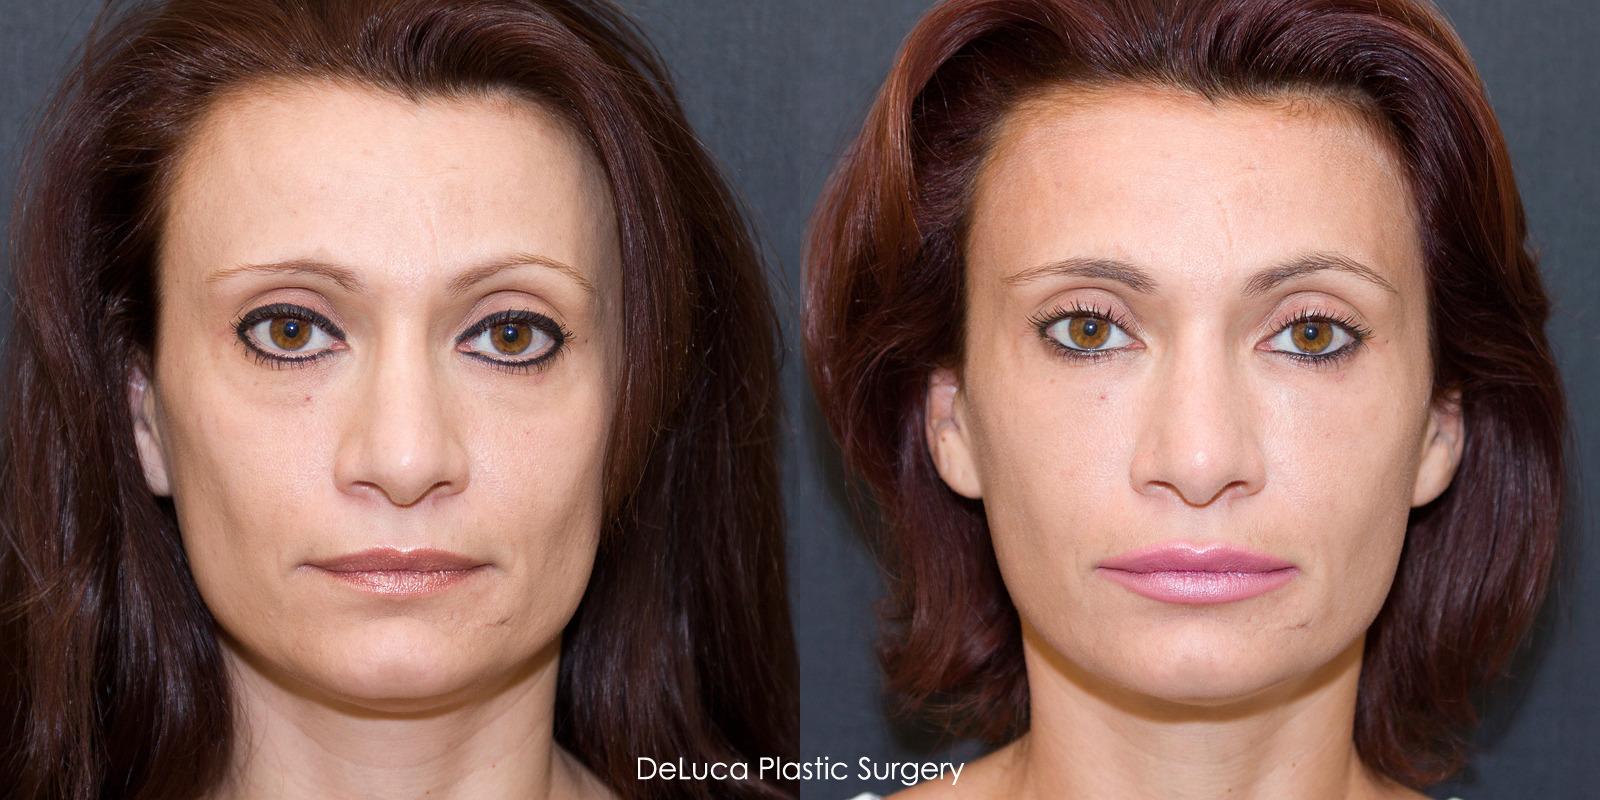 Juvederm Cheek Filler Before and After